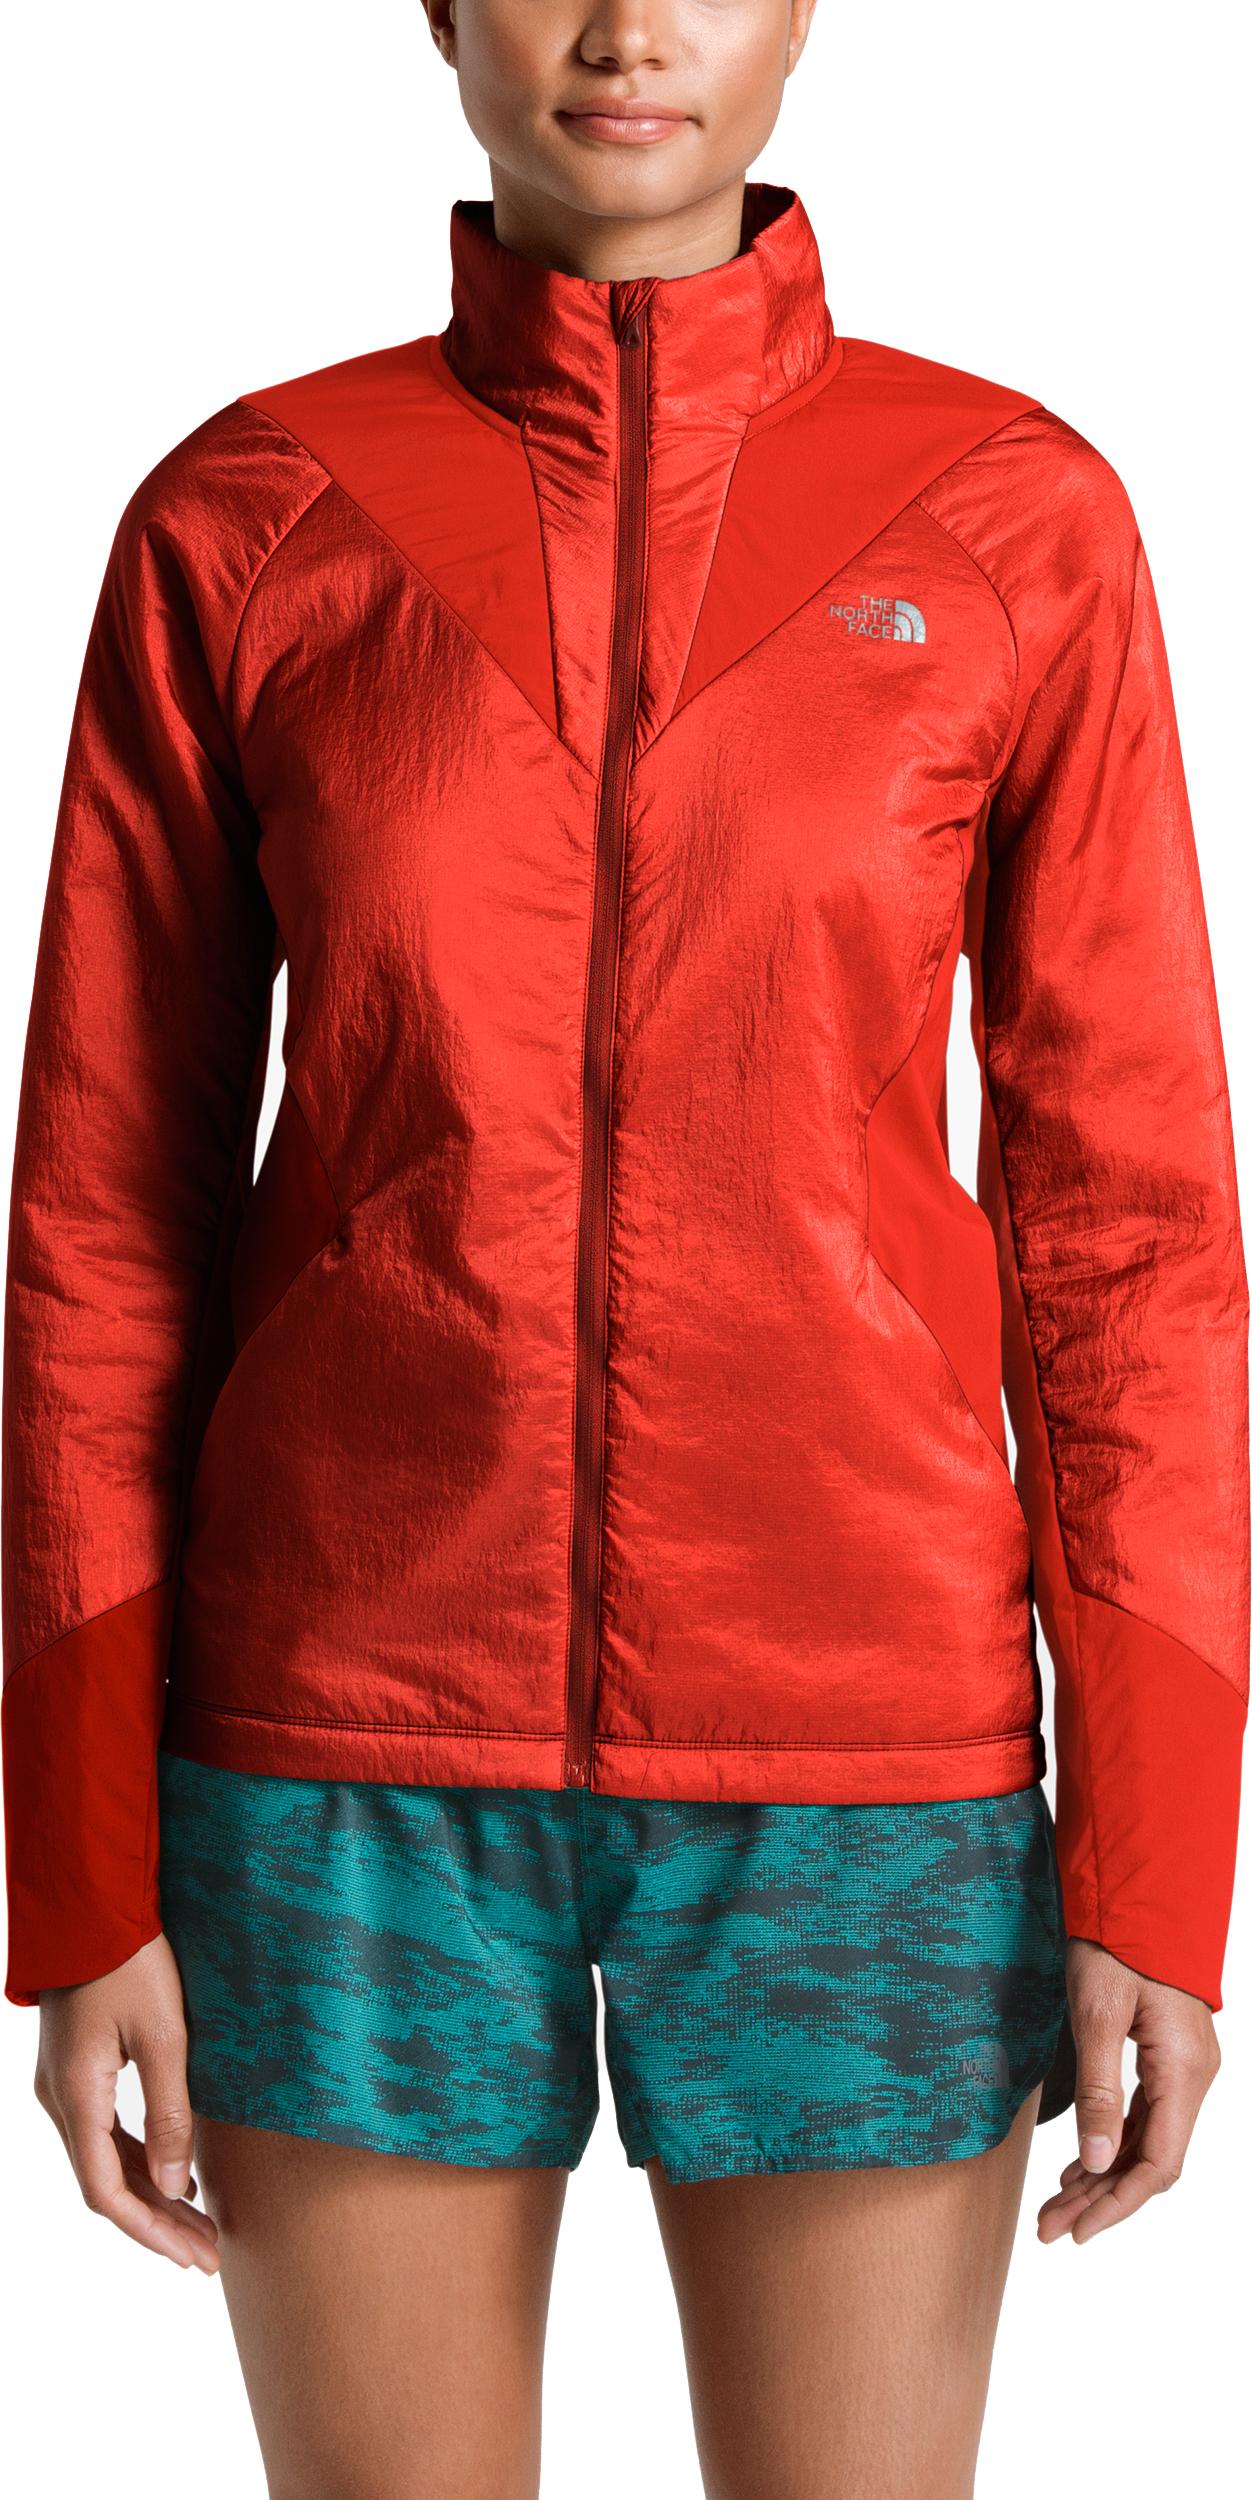 1bf0d5558 The North Face Flight Ventrix Jacket - Women's